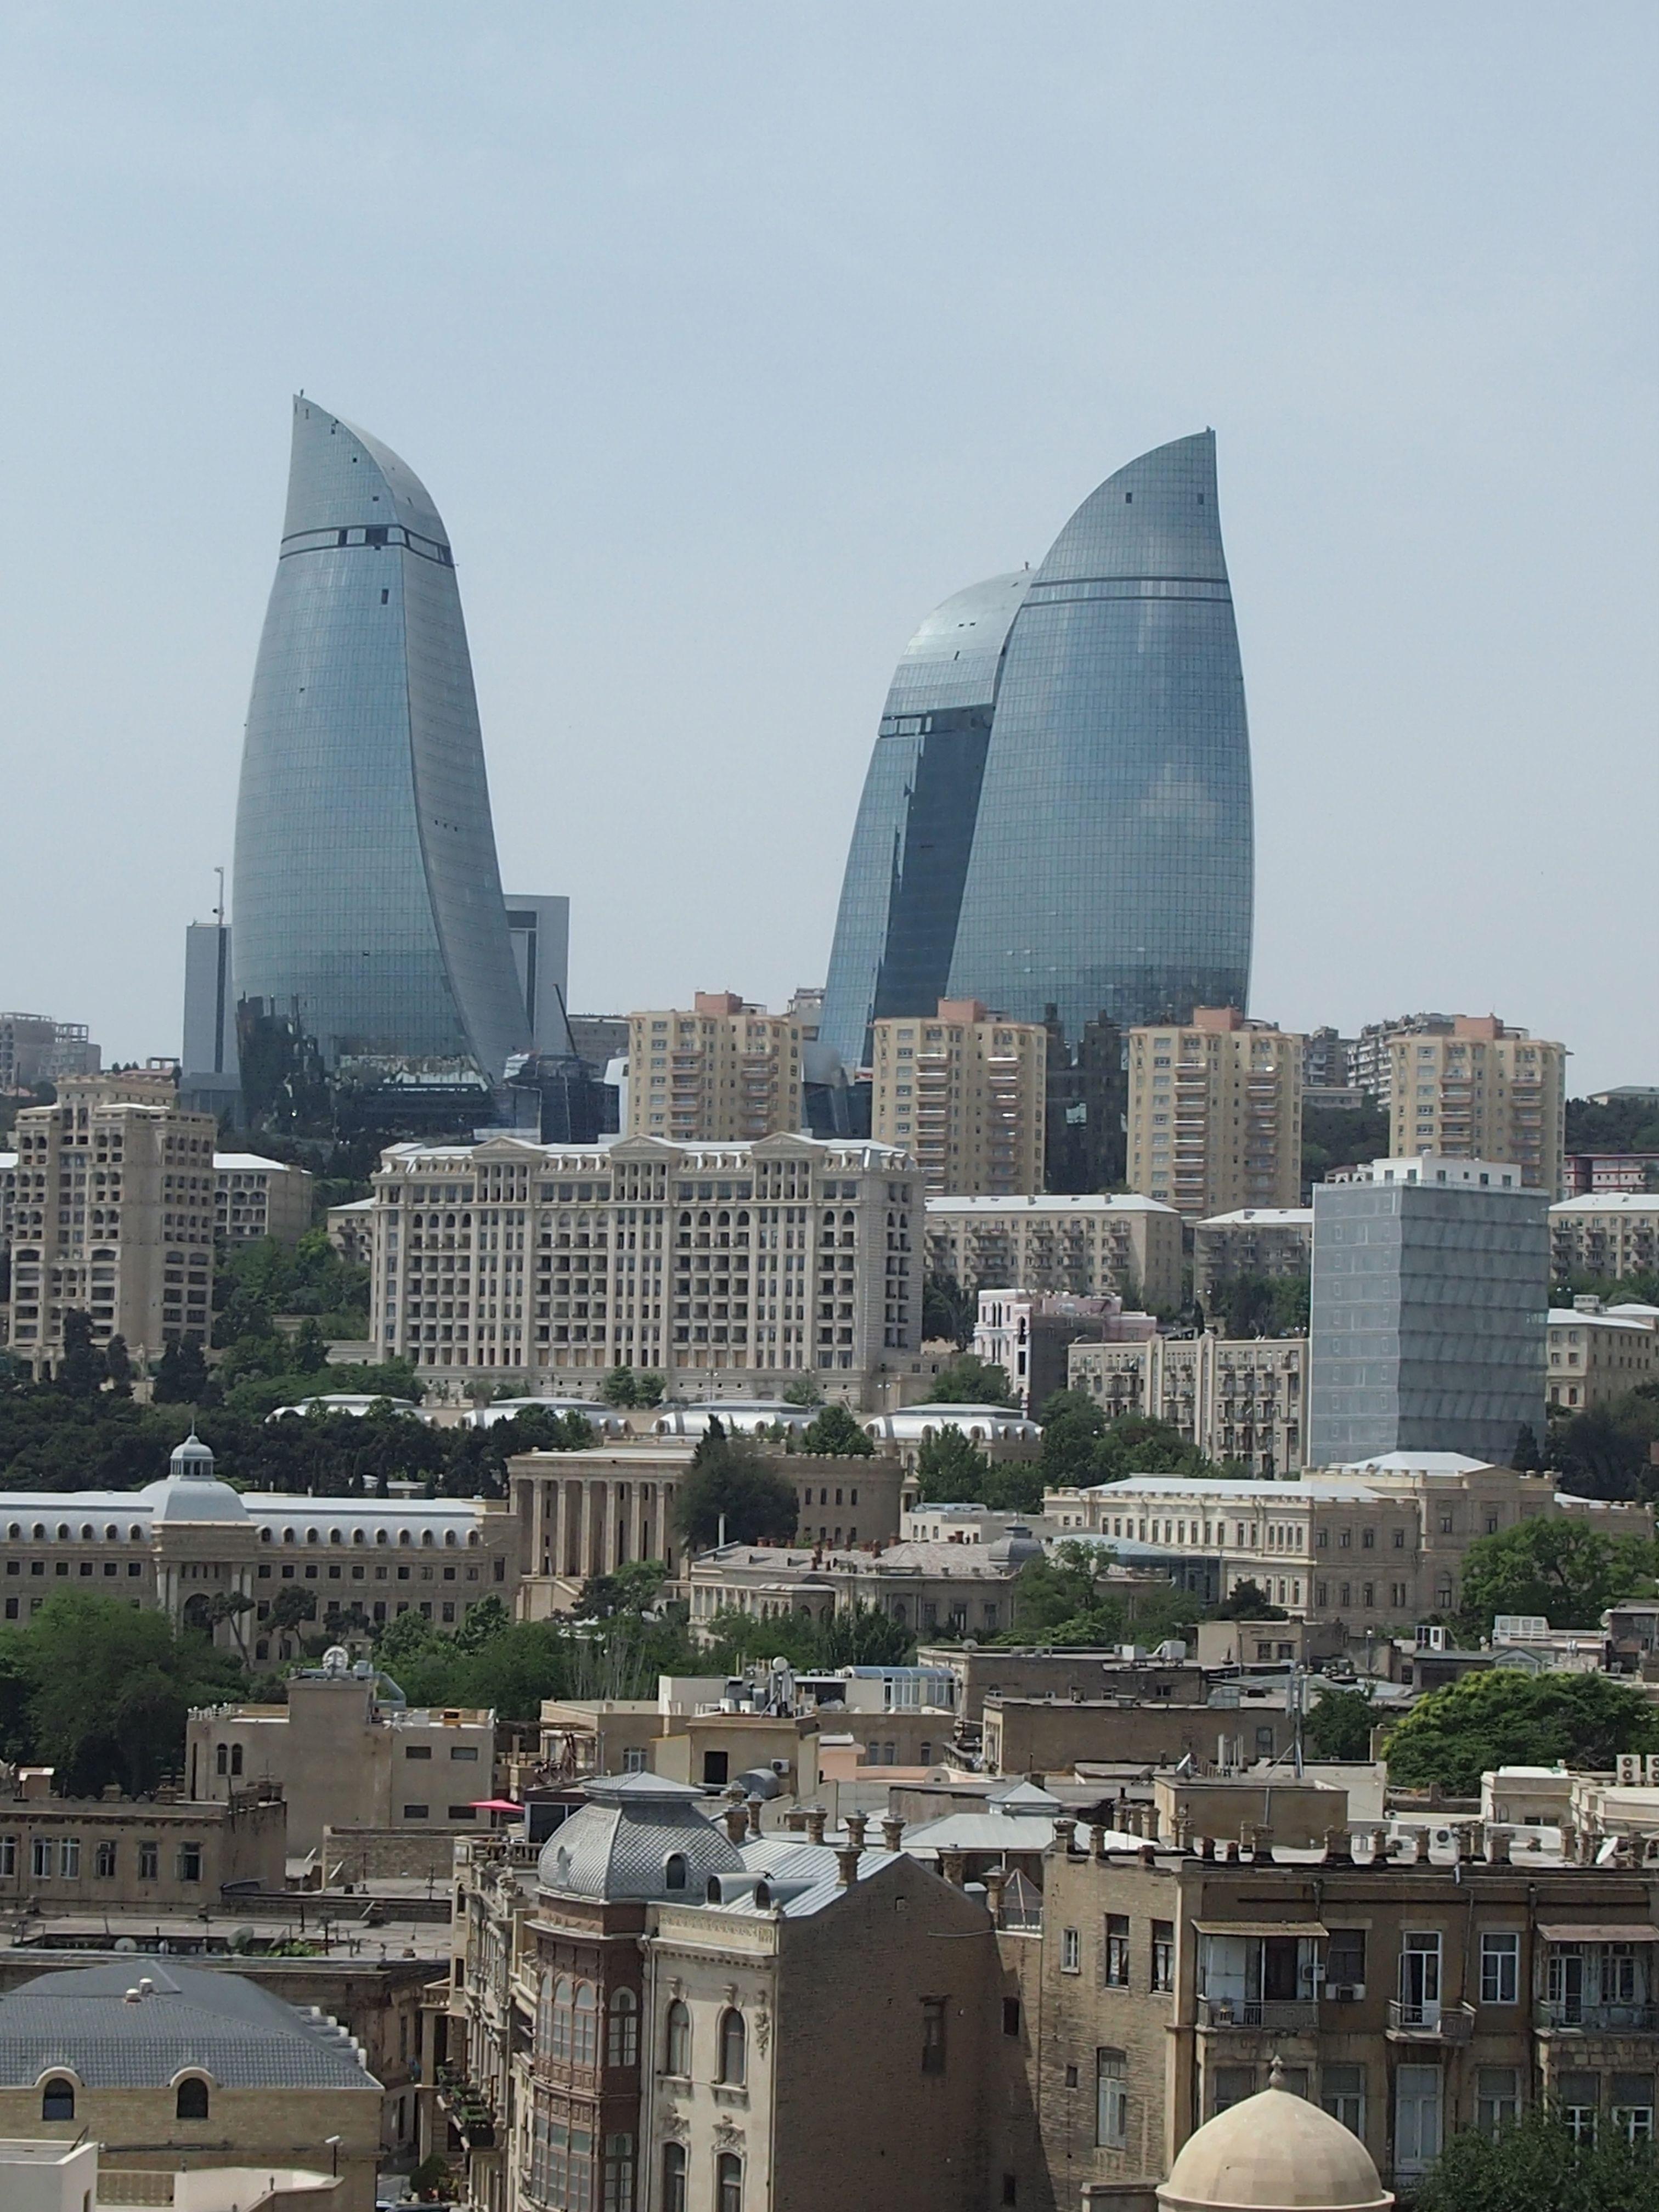 Flame Towers Baku Azerbaijan Hok 2007 Baku City City Photography Places To Go